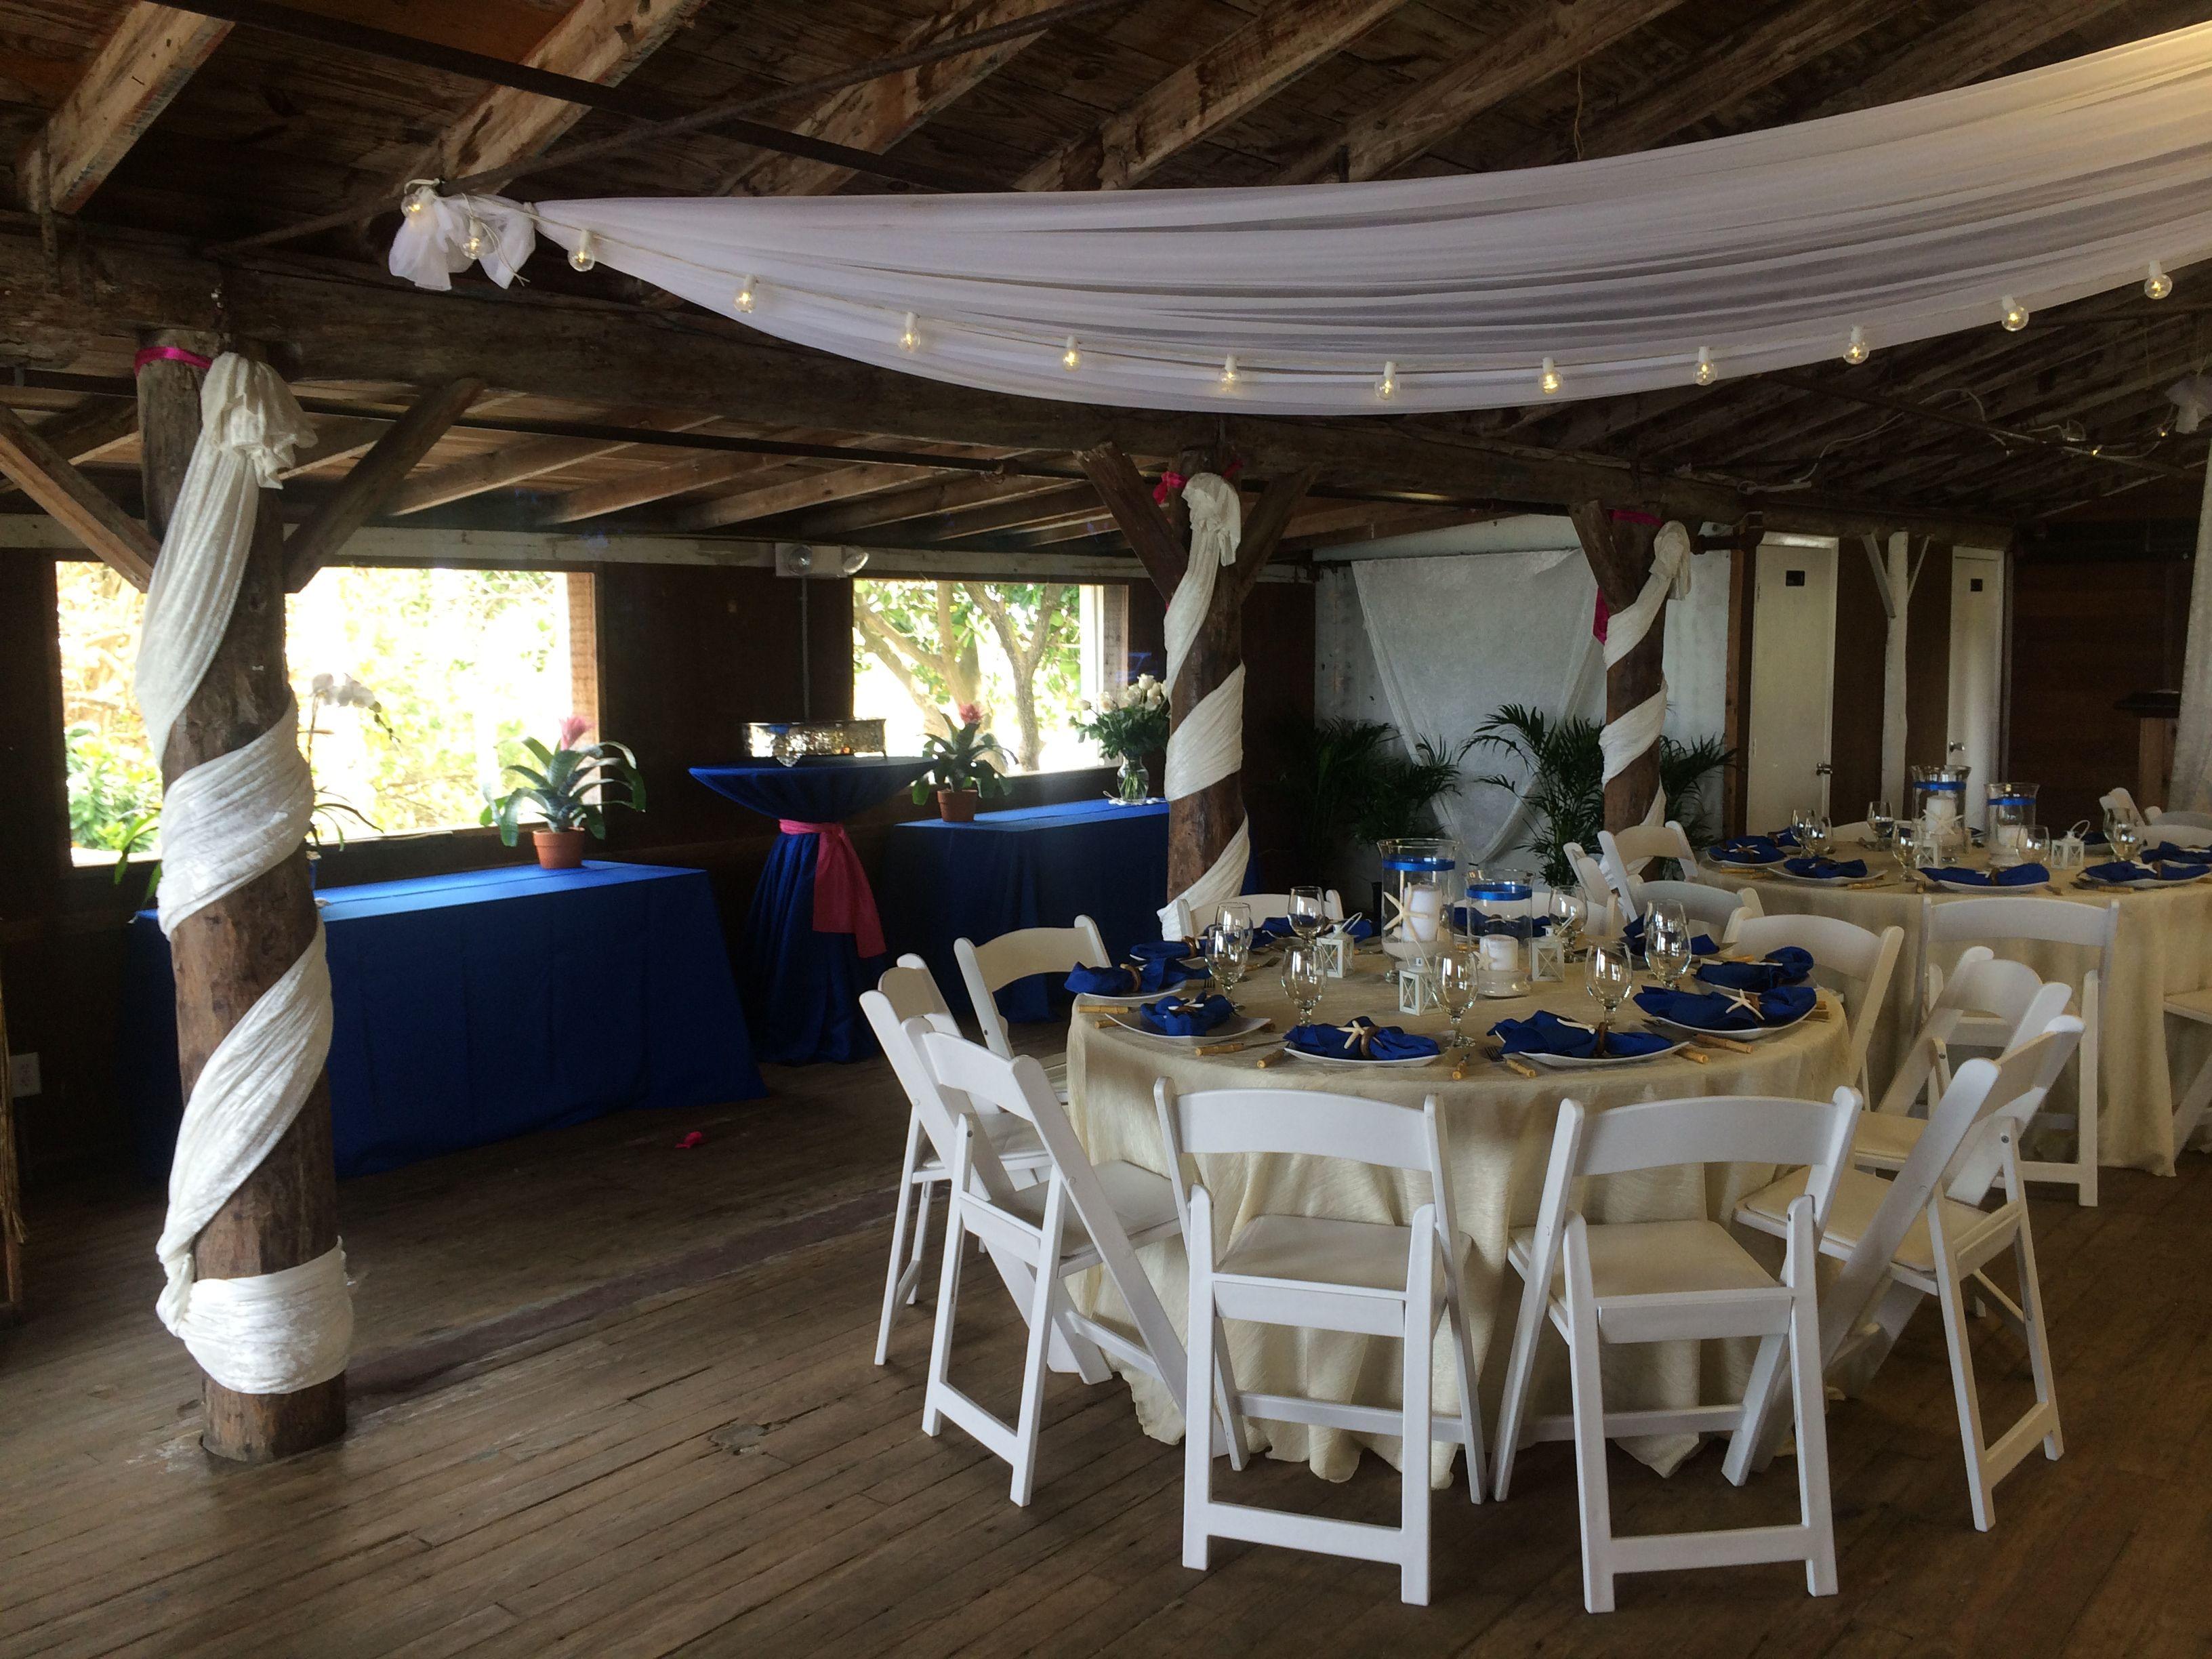 Elegant White Organza Draping With Romantic Bistro Lighting For A Wedding Reception At The Jupiter Civic VenuesWedding ReceptionBeach